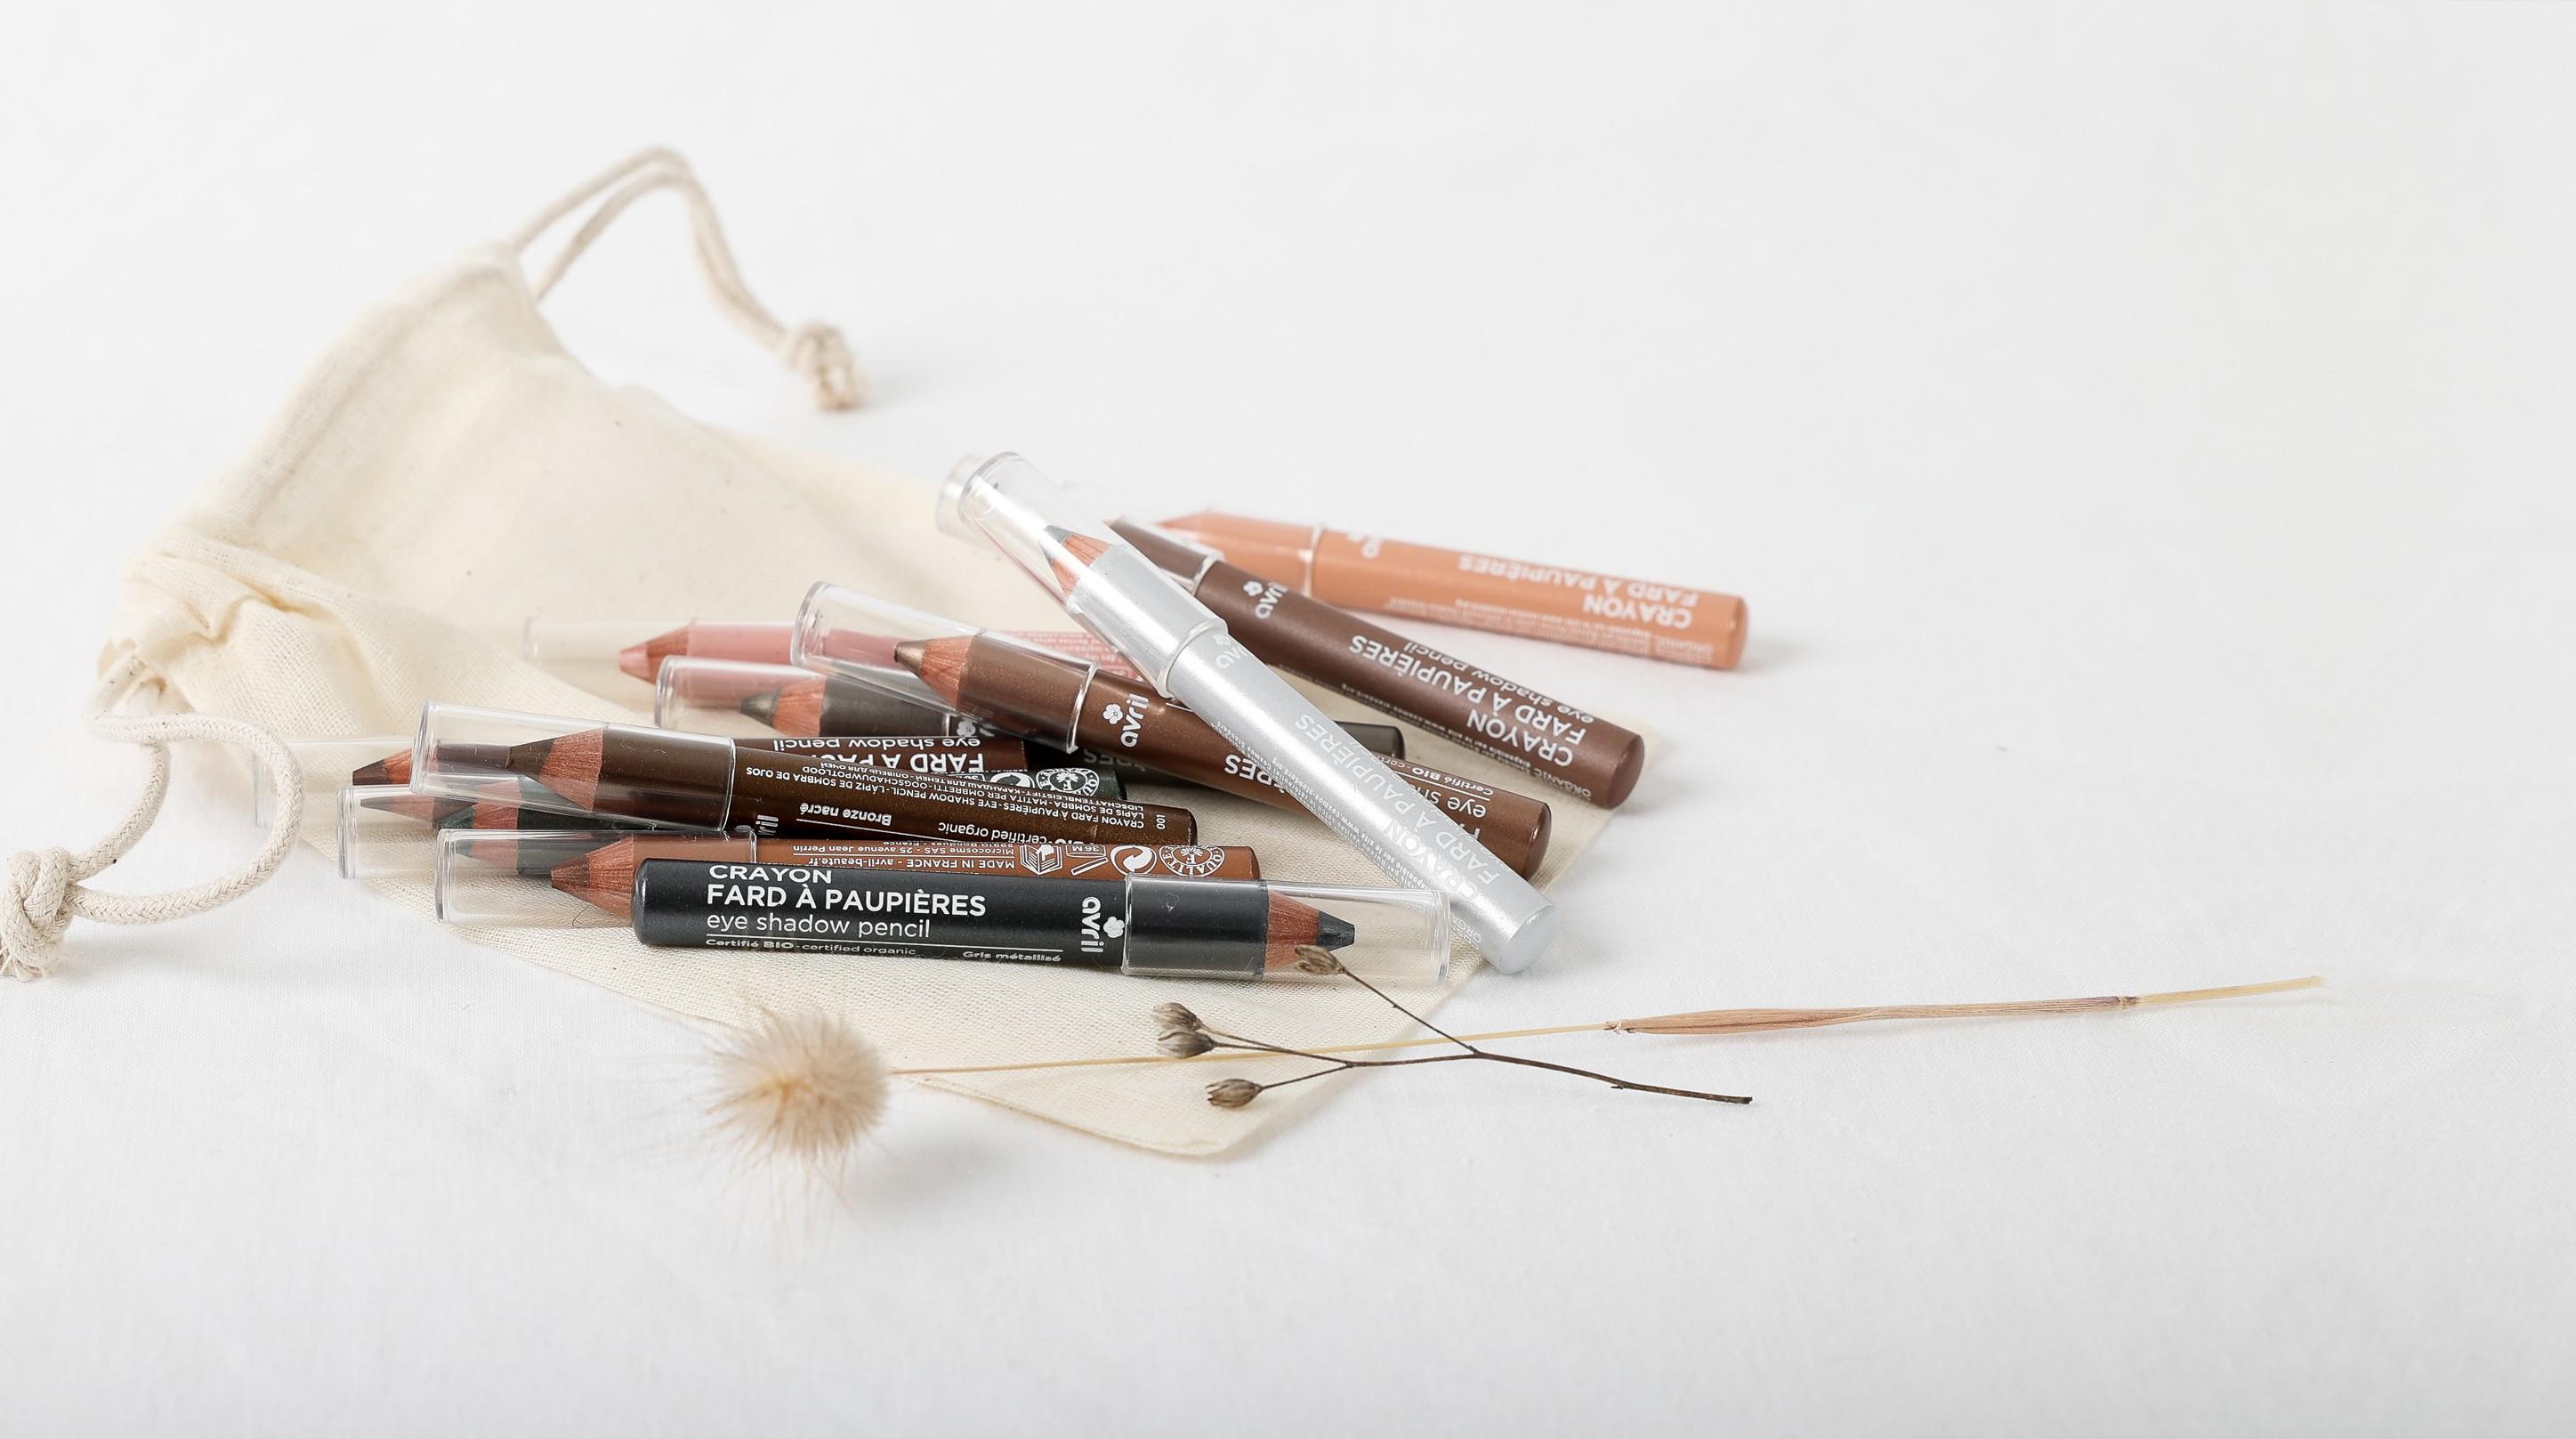 Crayon fard à paupières Gris métallisé  Certified organic